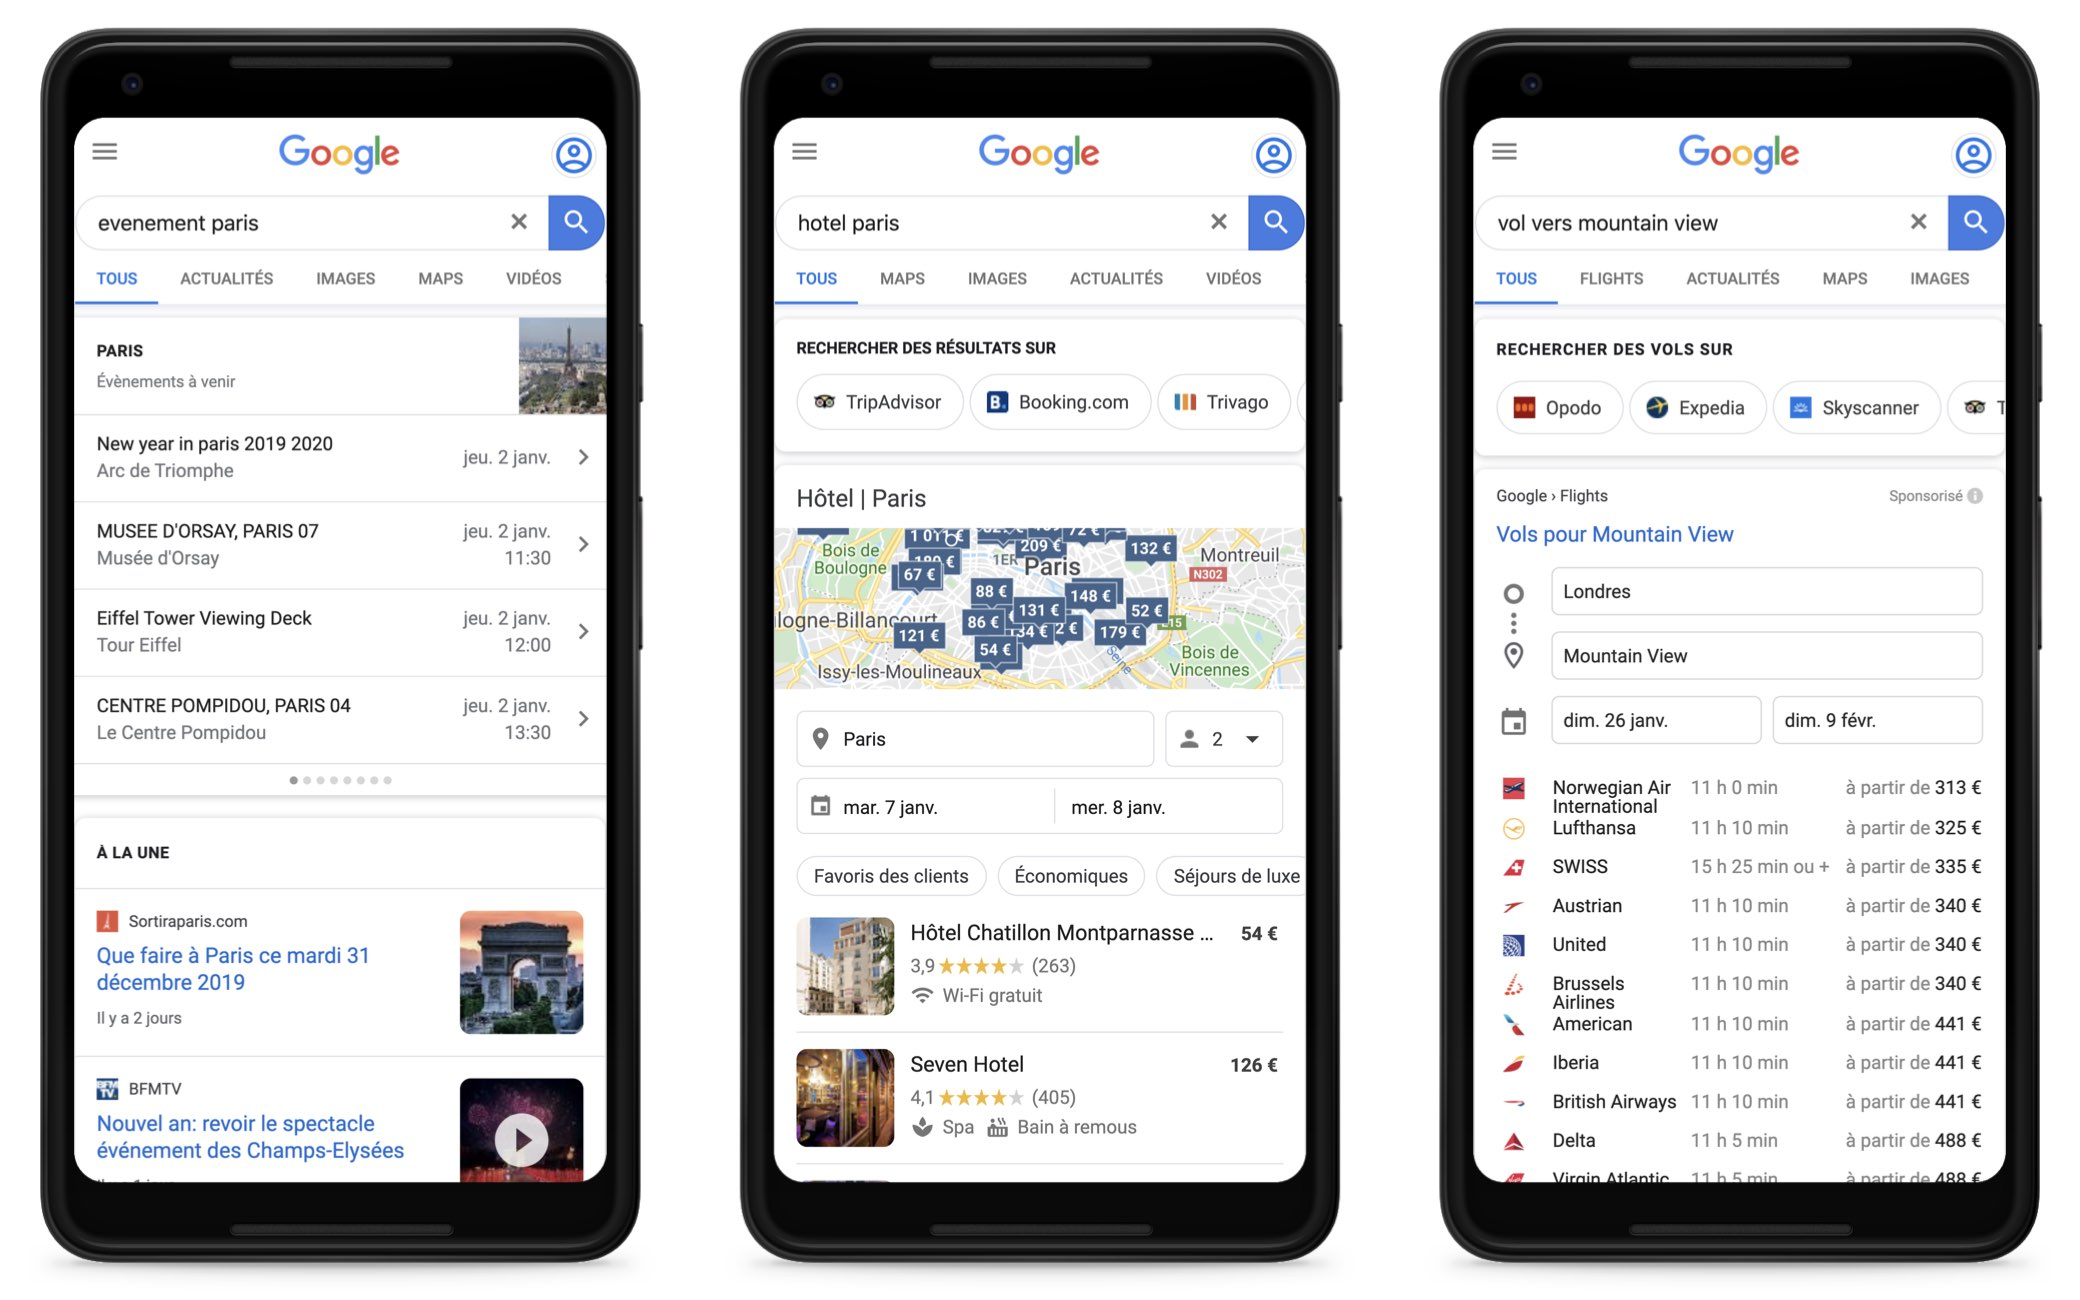 evenements, hotels, vols Google